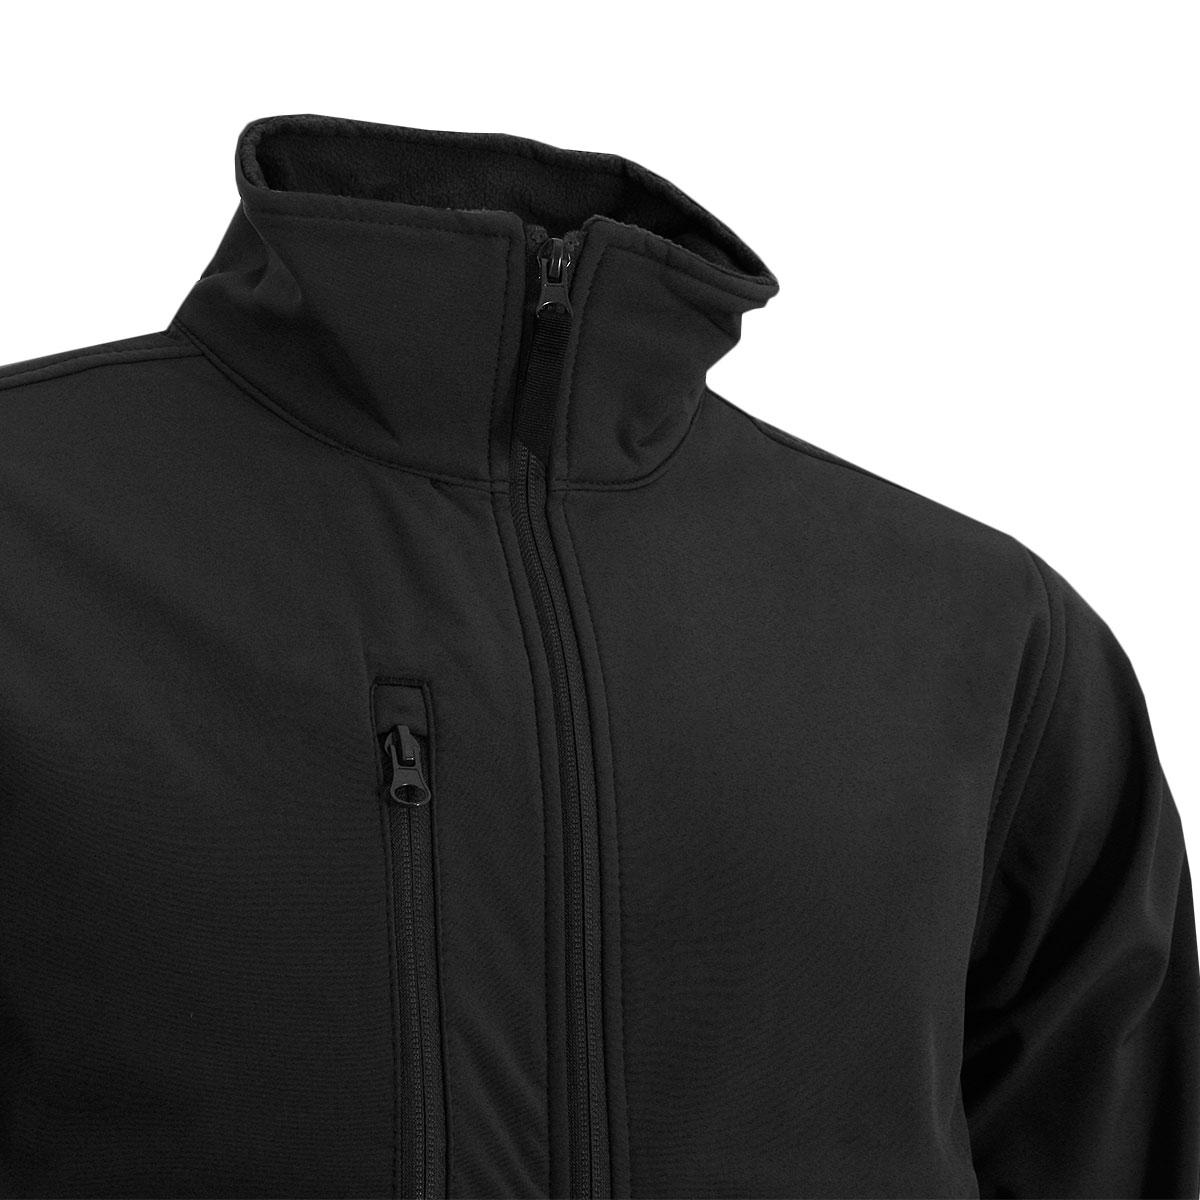 Regatta-Mens-Void-Softshell-Water-Repellent-Windproof-Jacket-60-OFF-RRP thumbnail 4